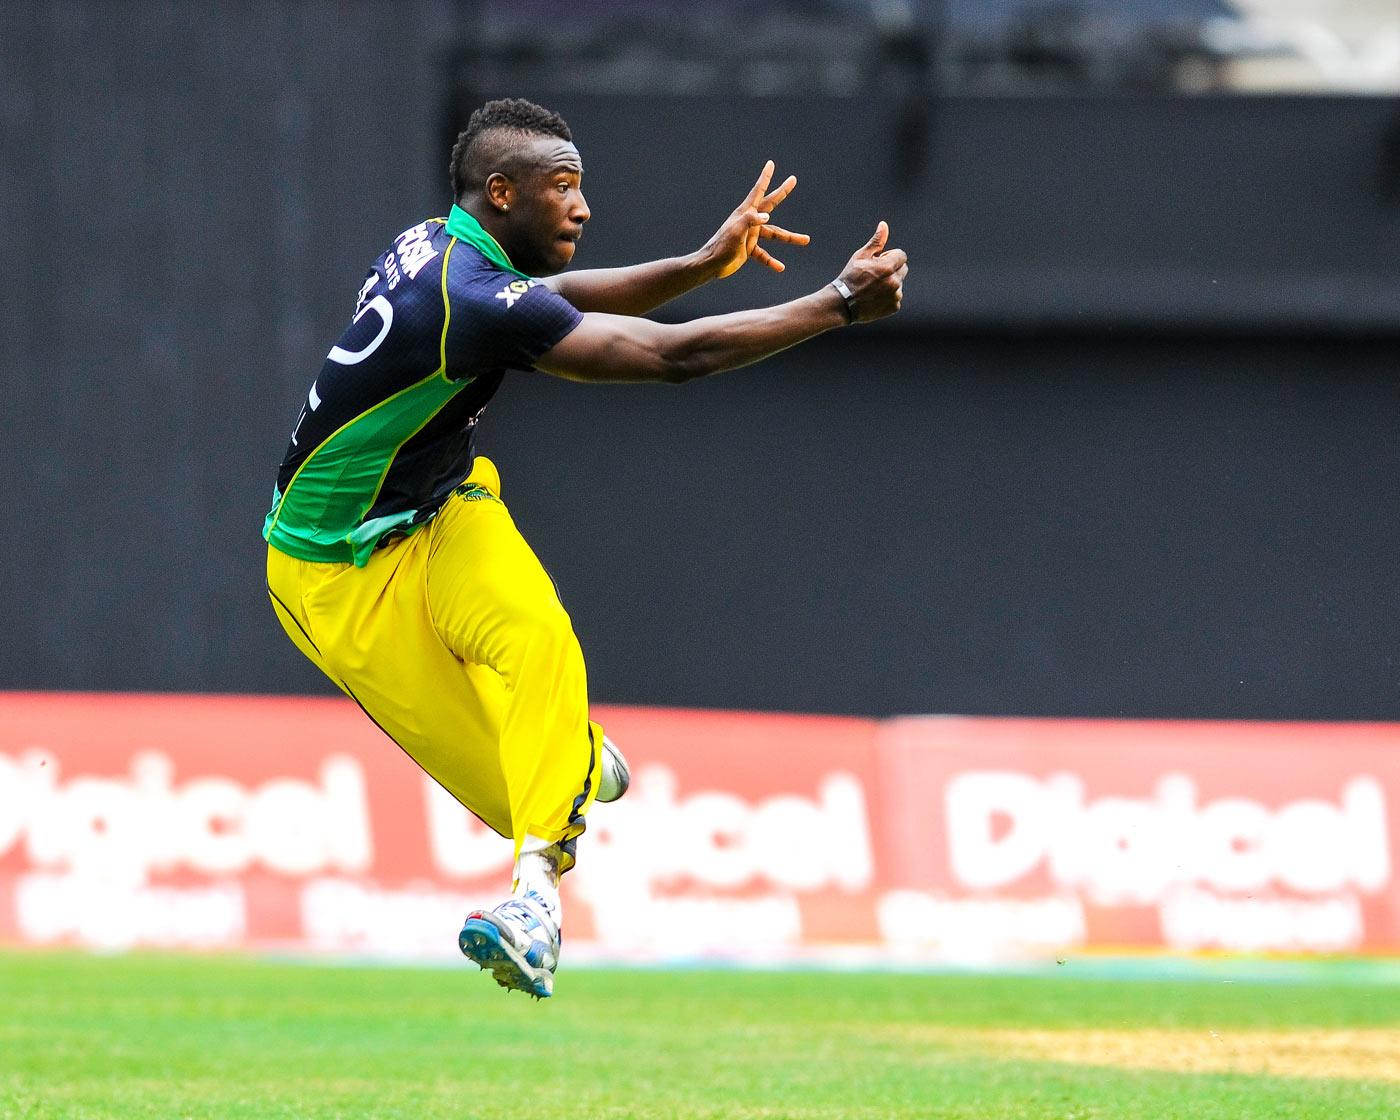 Cricket Photos | Caribbean Premier League | ESPN Cricinfo